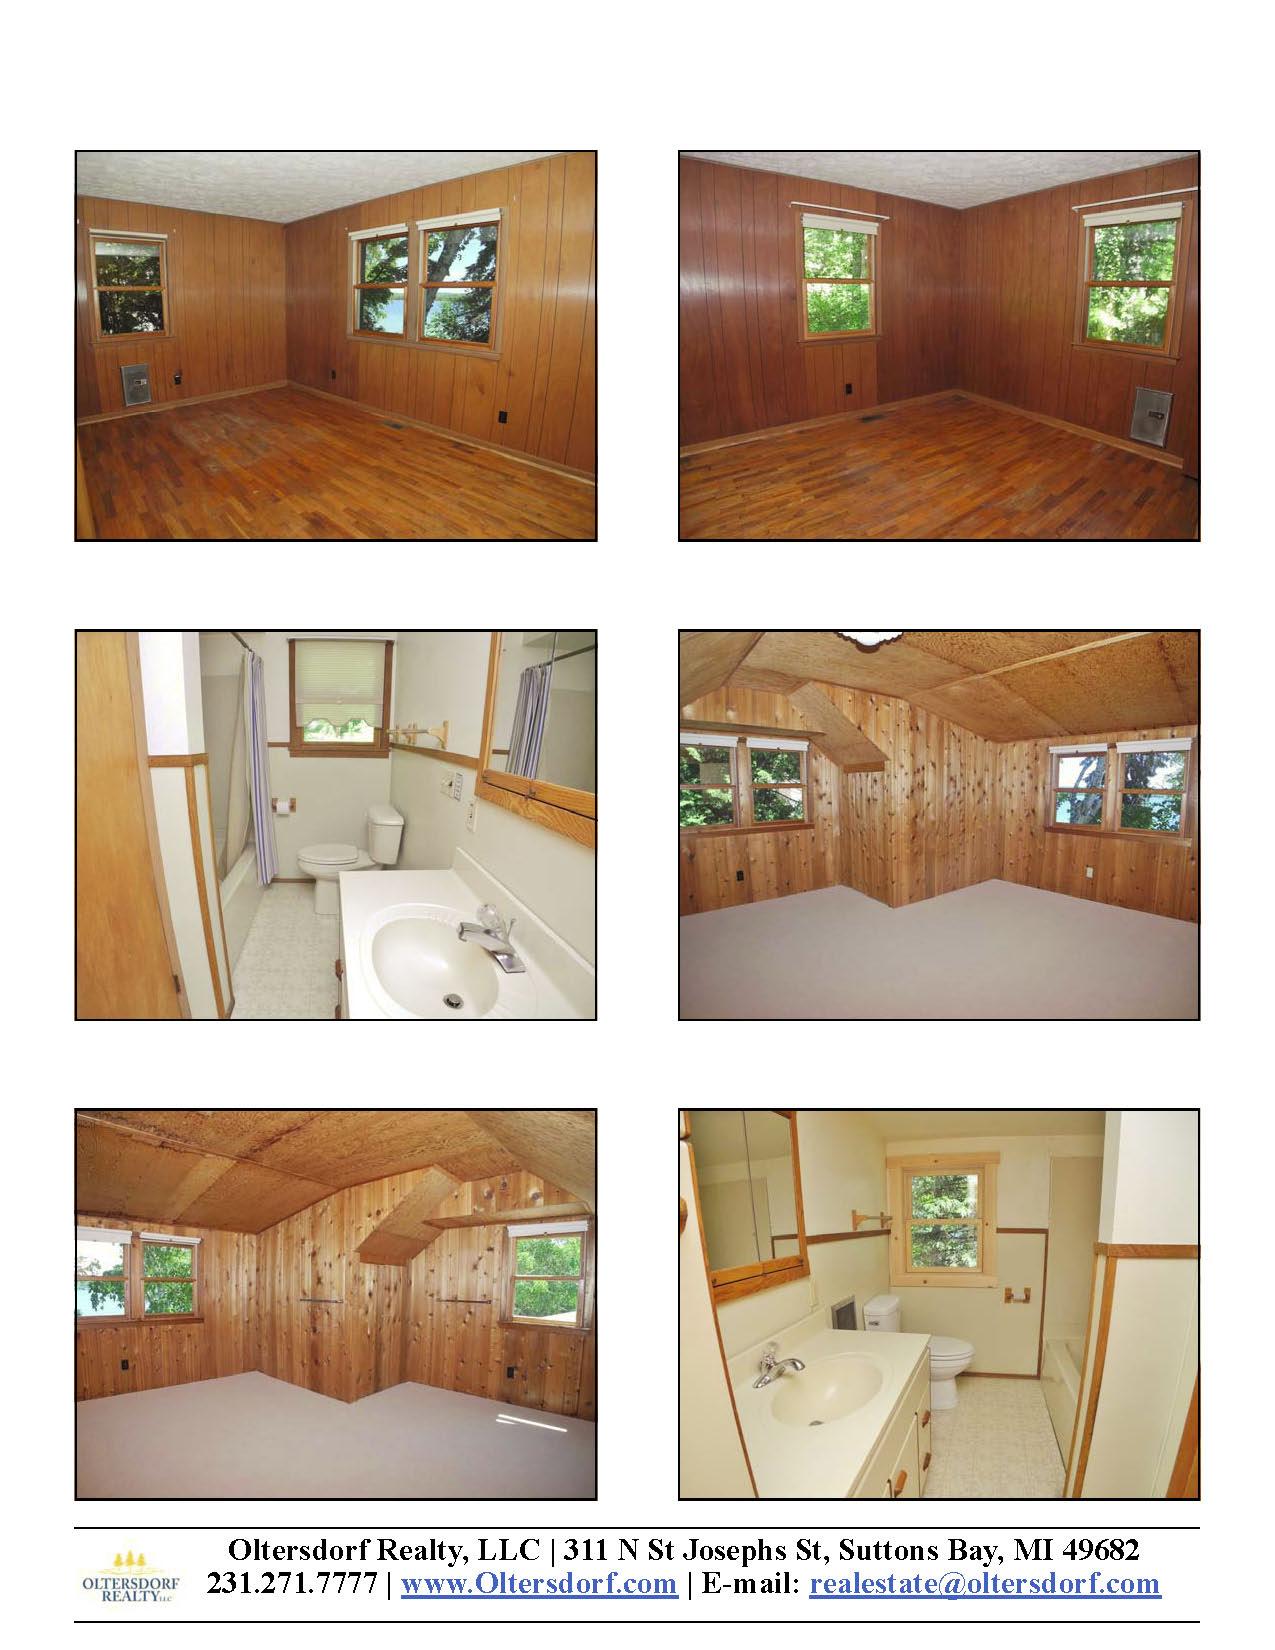 4388 N Manitou Trail, Leland - Marketing packet by Oltersdorf Realty LLC (6).jpg